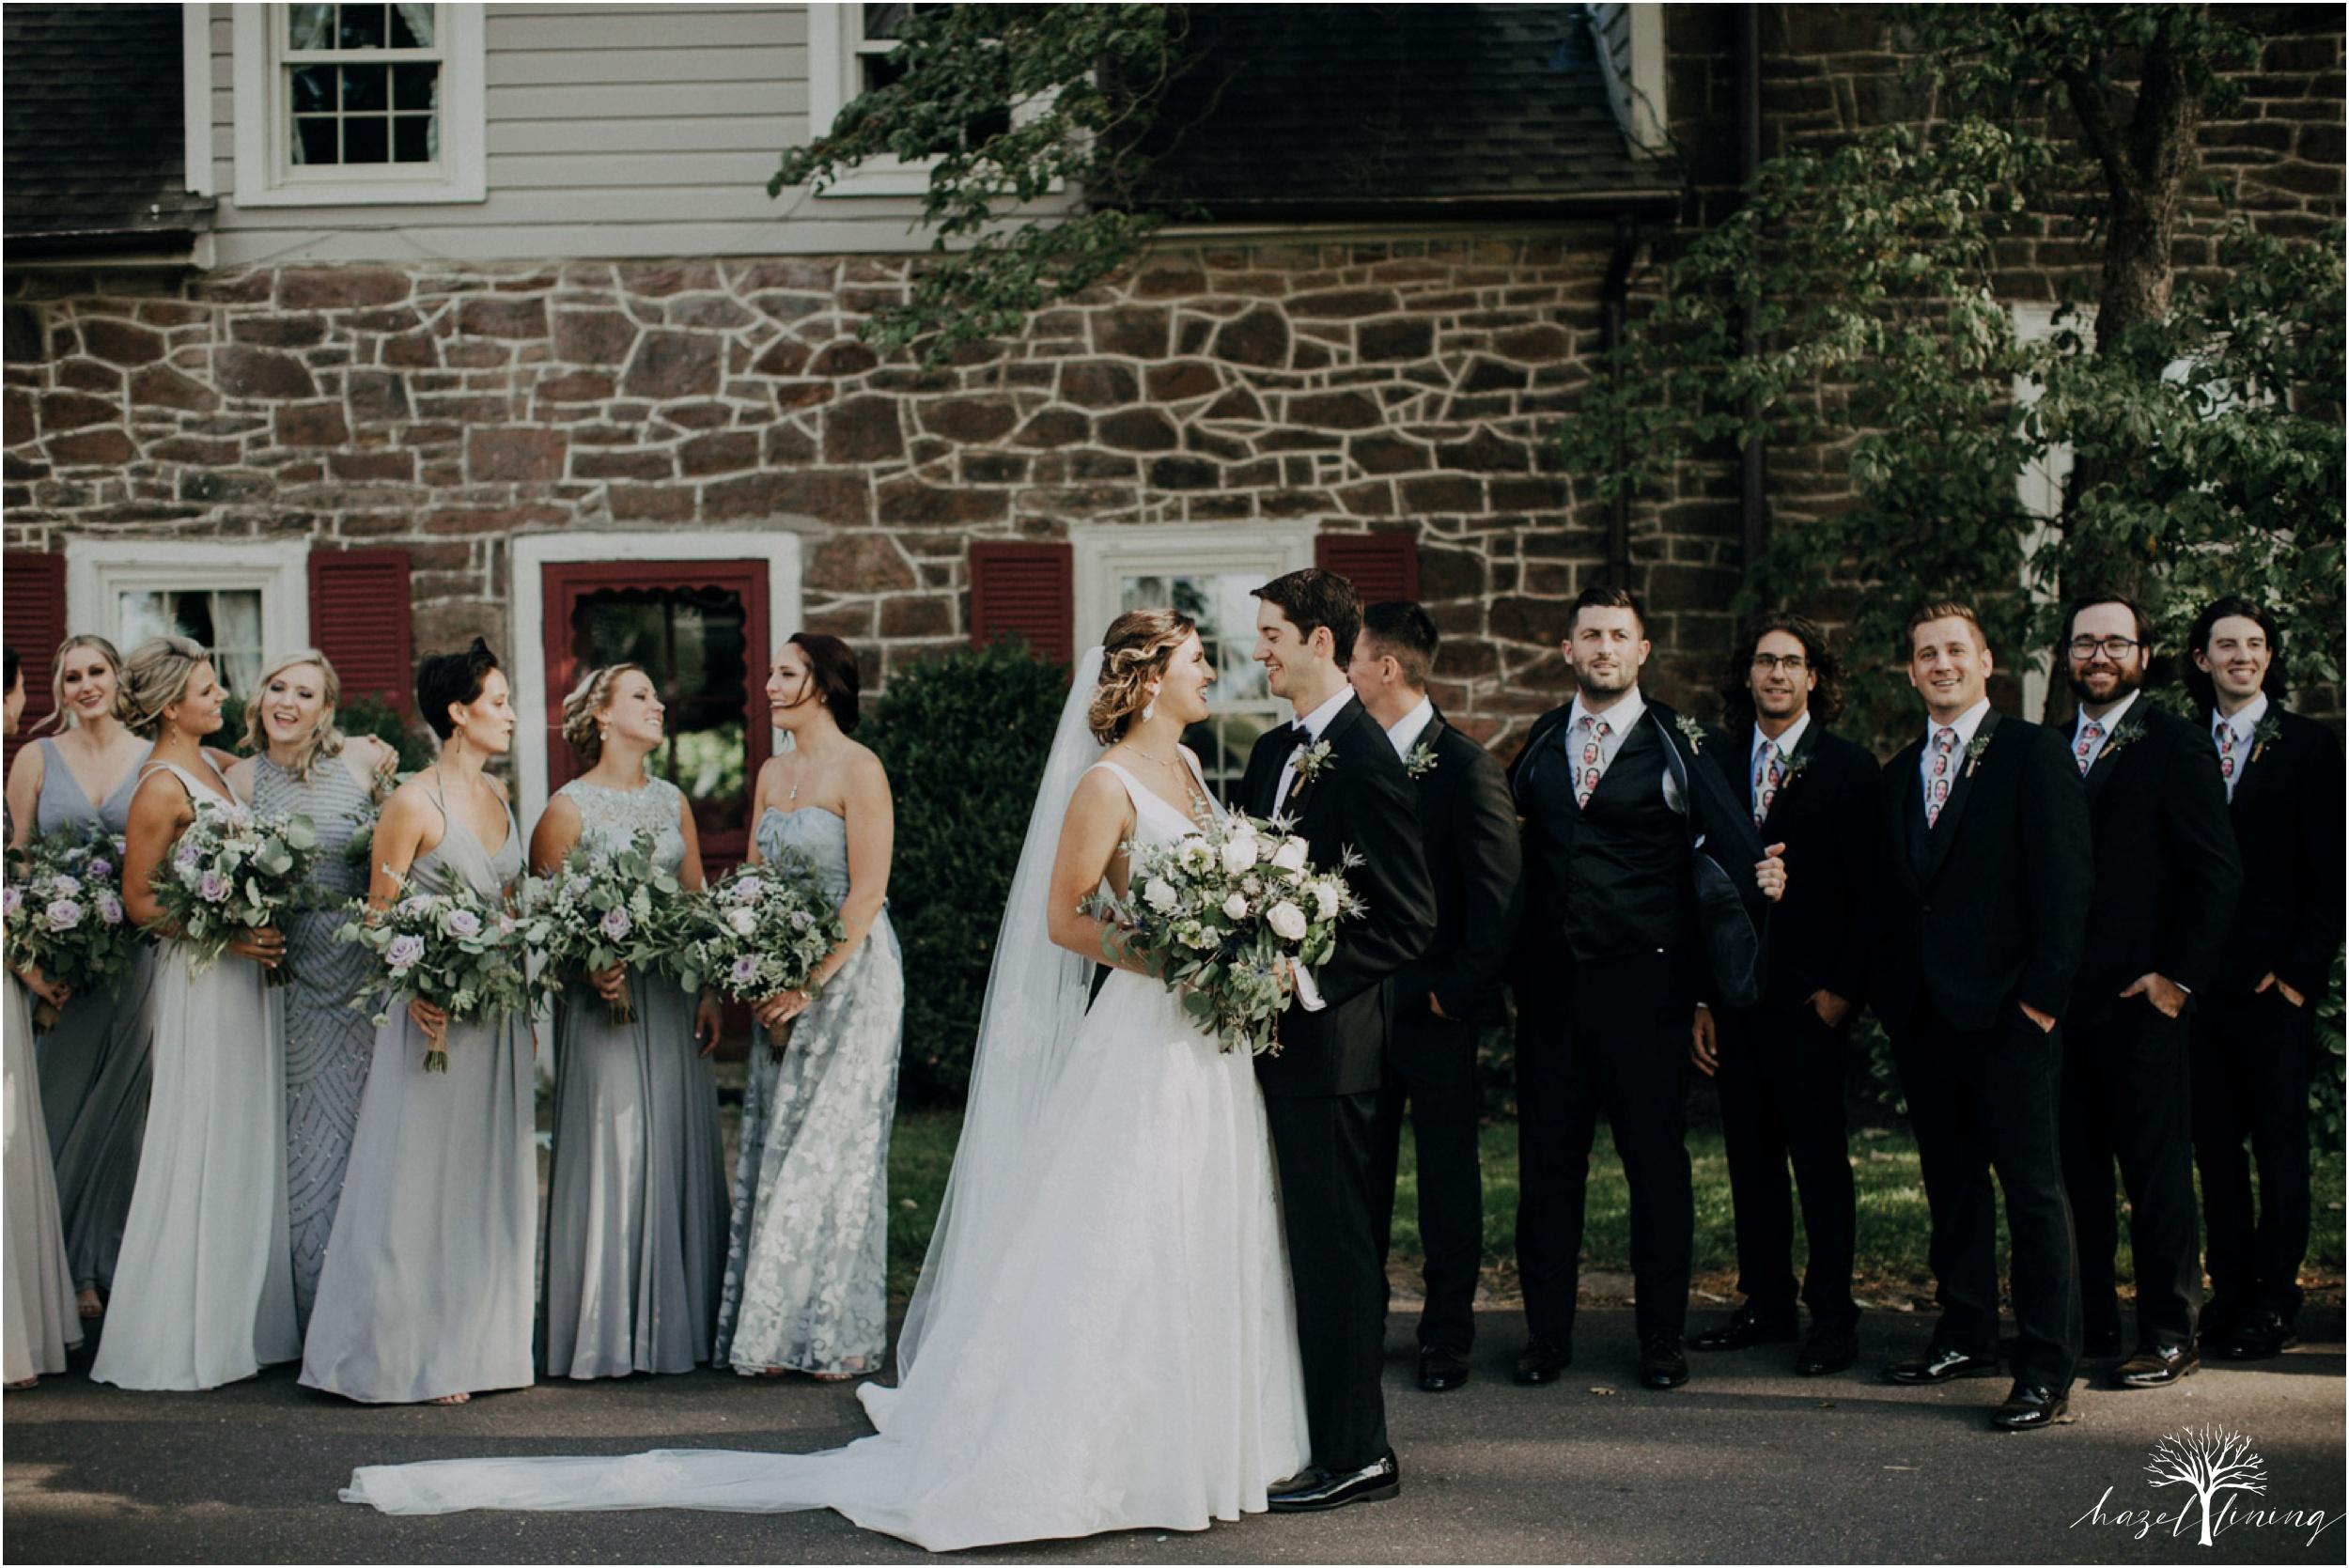 maureen-hepner-anthony-giordano-rose-bank-winery-newtow-pennsylvania-luxury-summer-wedding-hazel-lining-photography-destination-elopement-wedding-engagement-photography_0084.jpg